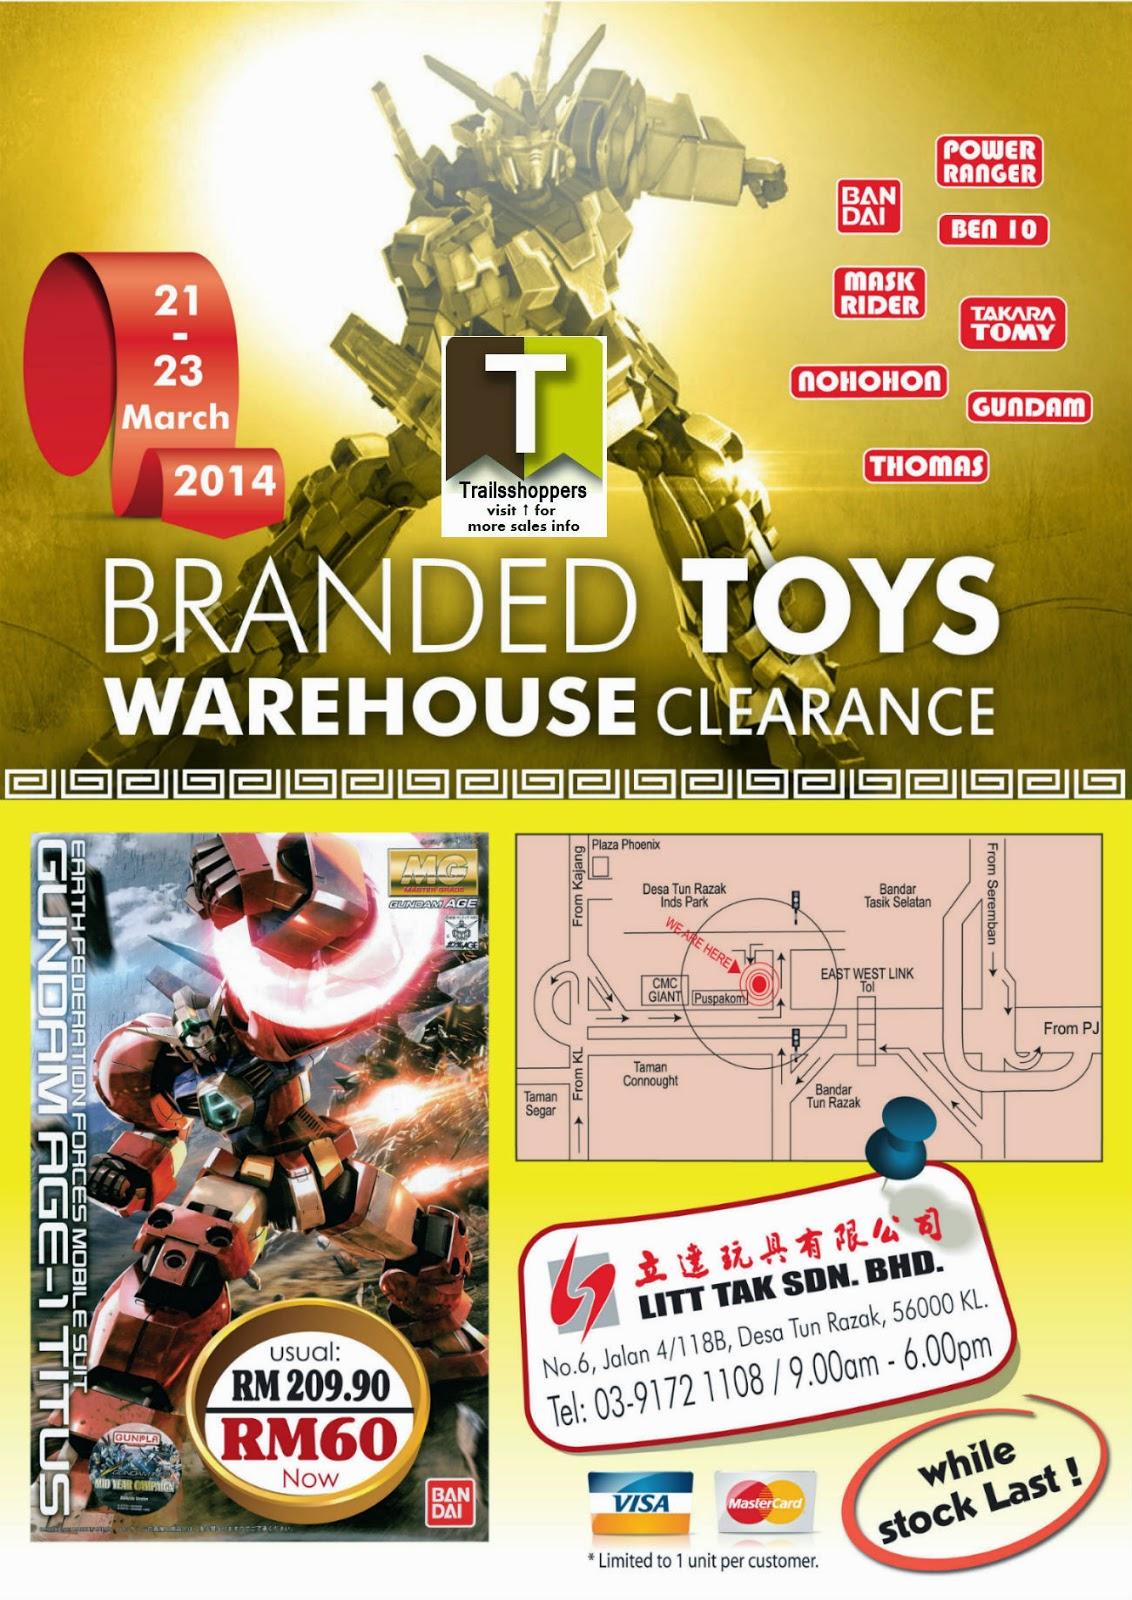 Litt Tak Branded Toys Warehouse Clearance Desa Tun Razak KL Kuala Lumpur